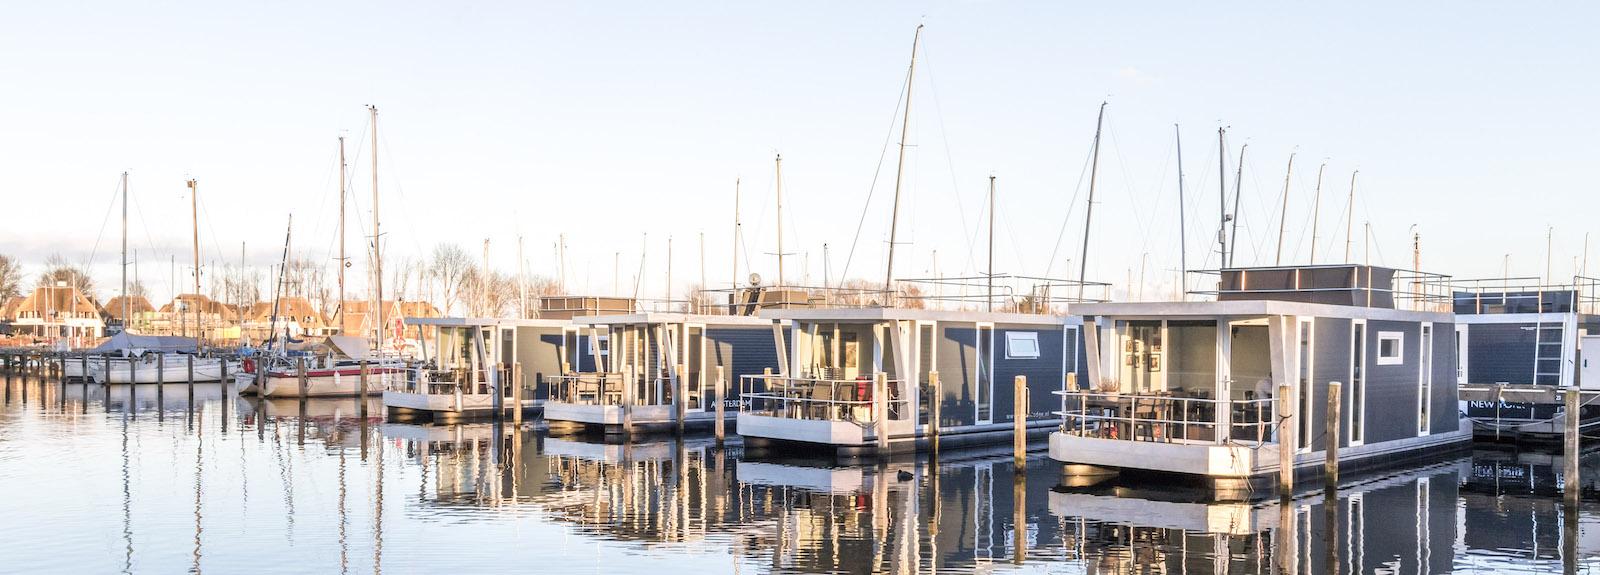 Supertrips - Waterlodges op het Veerse Meer